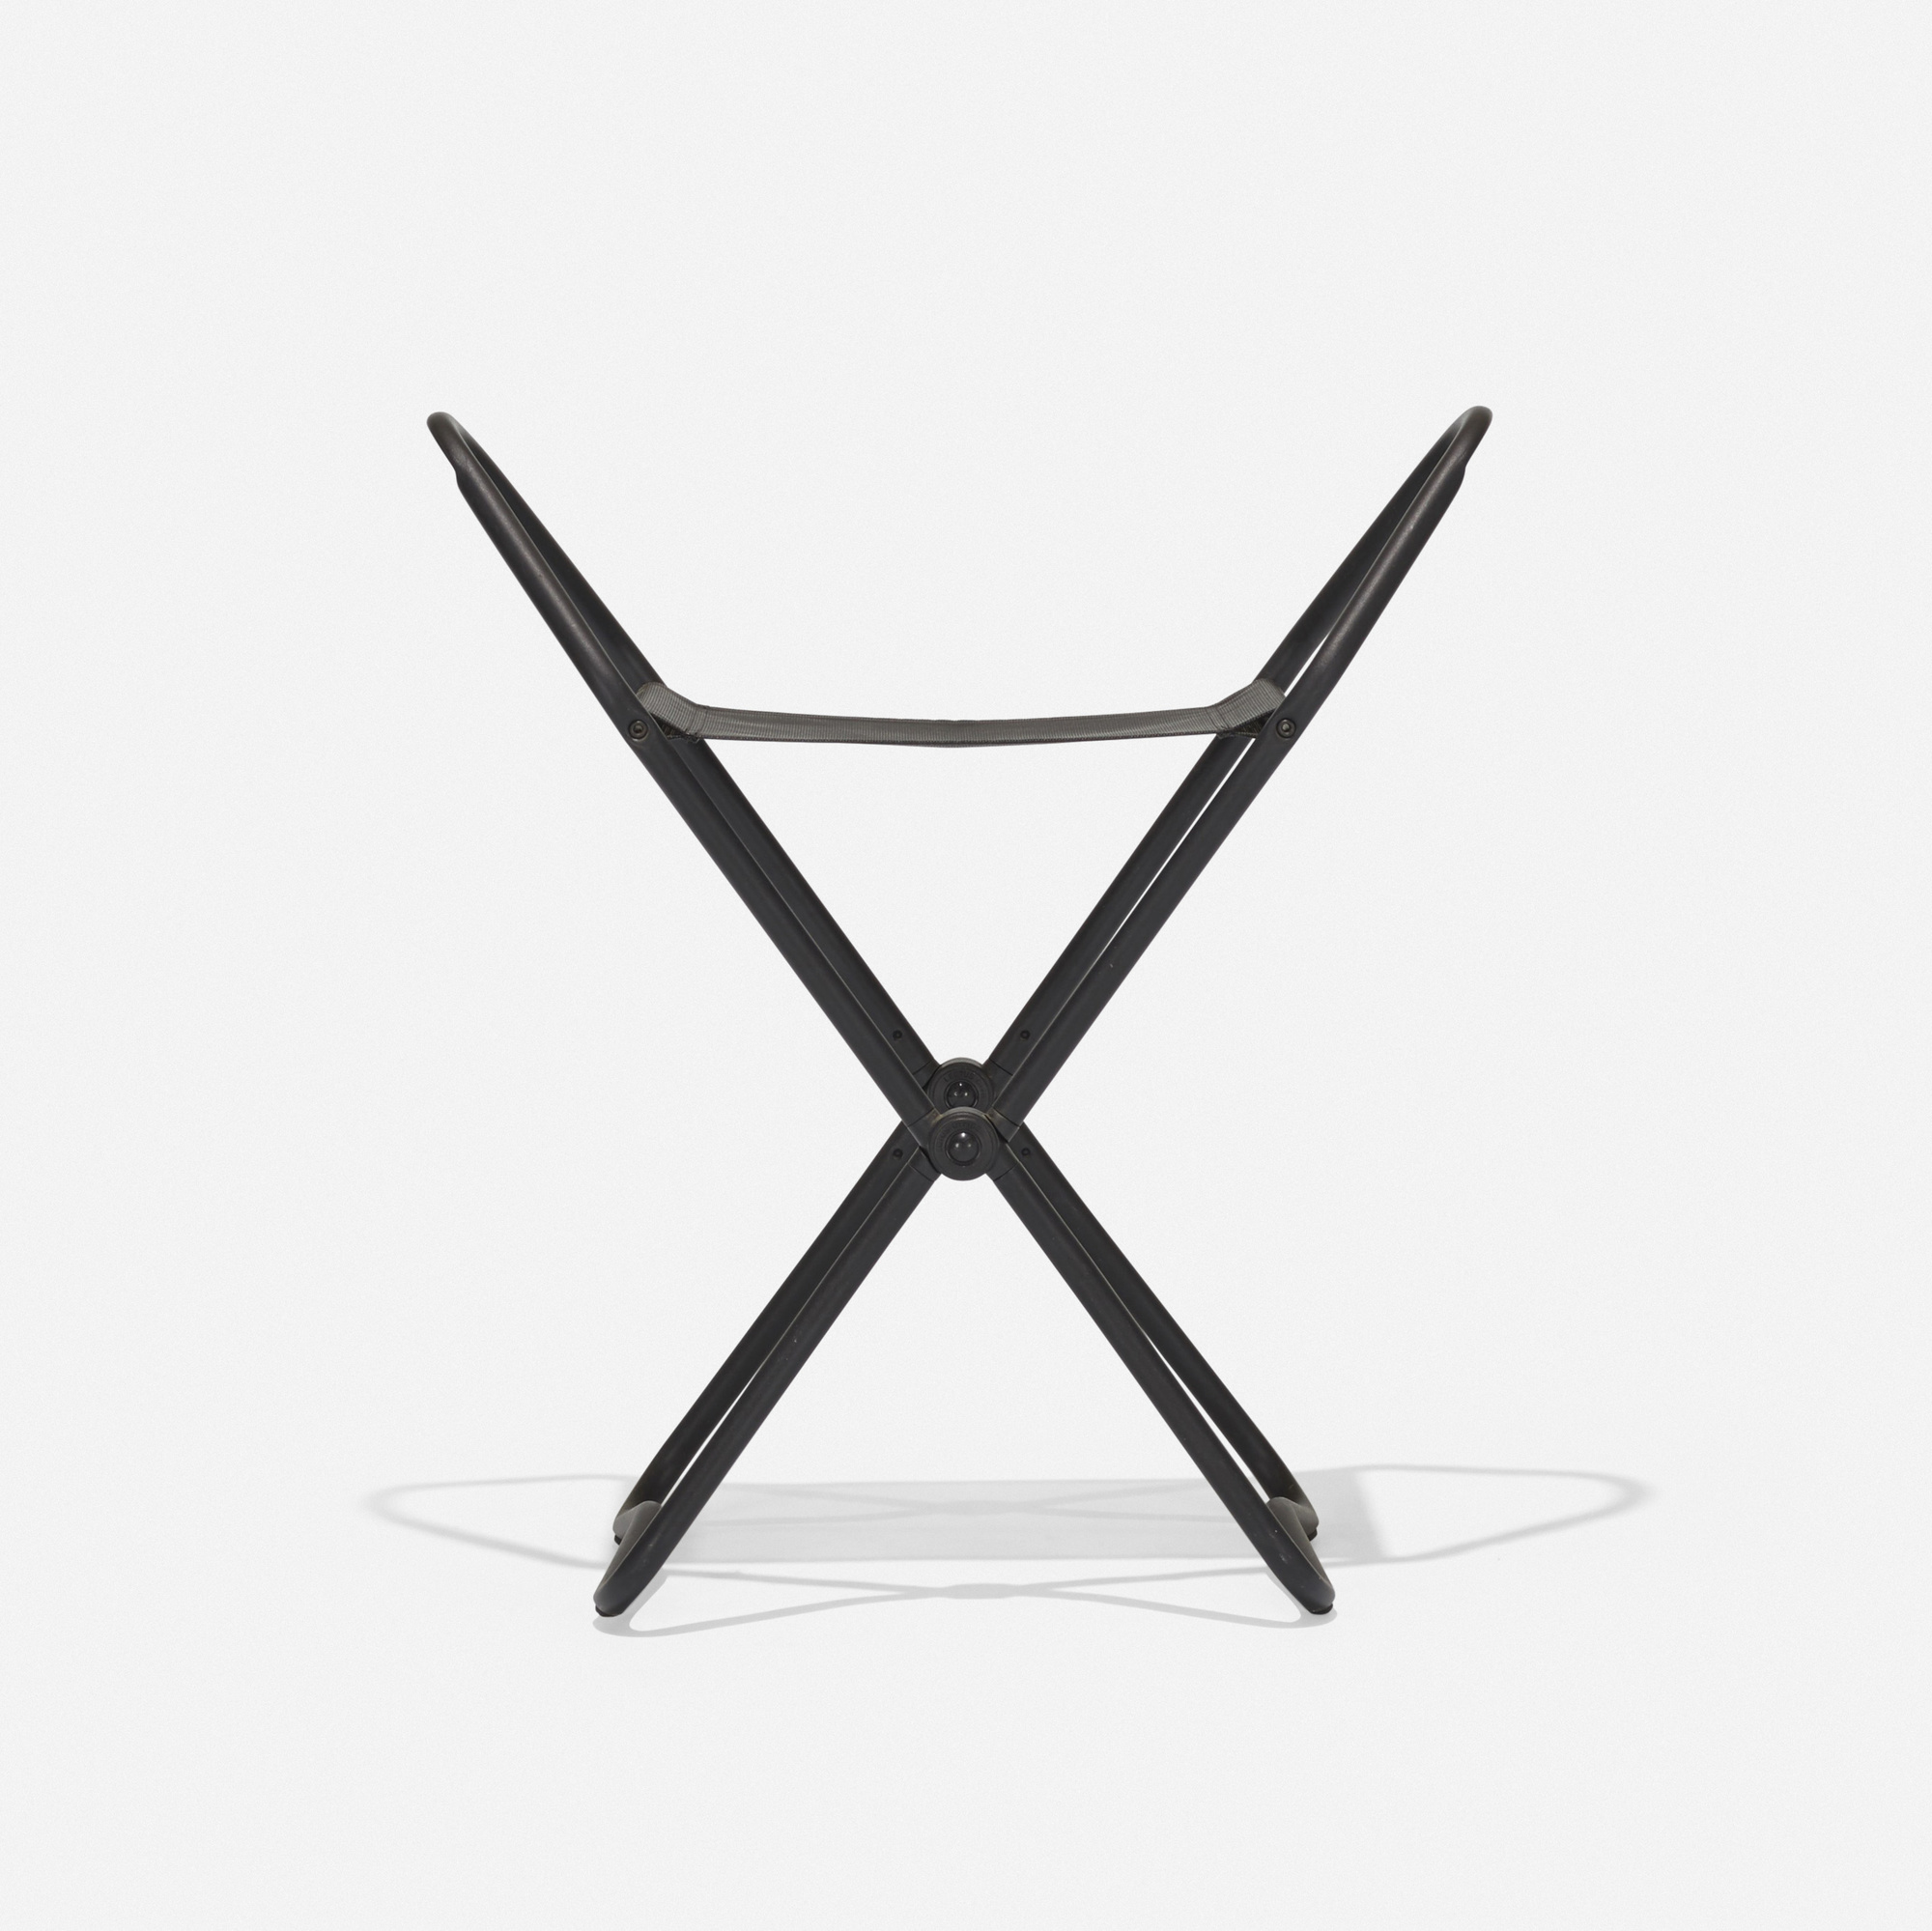 341: A & E Design (Tom Ahlström and Hans Ehrich) / Stockholm II folding stool (2 of 3)